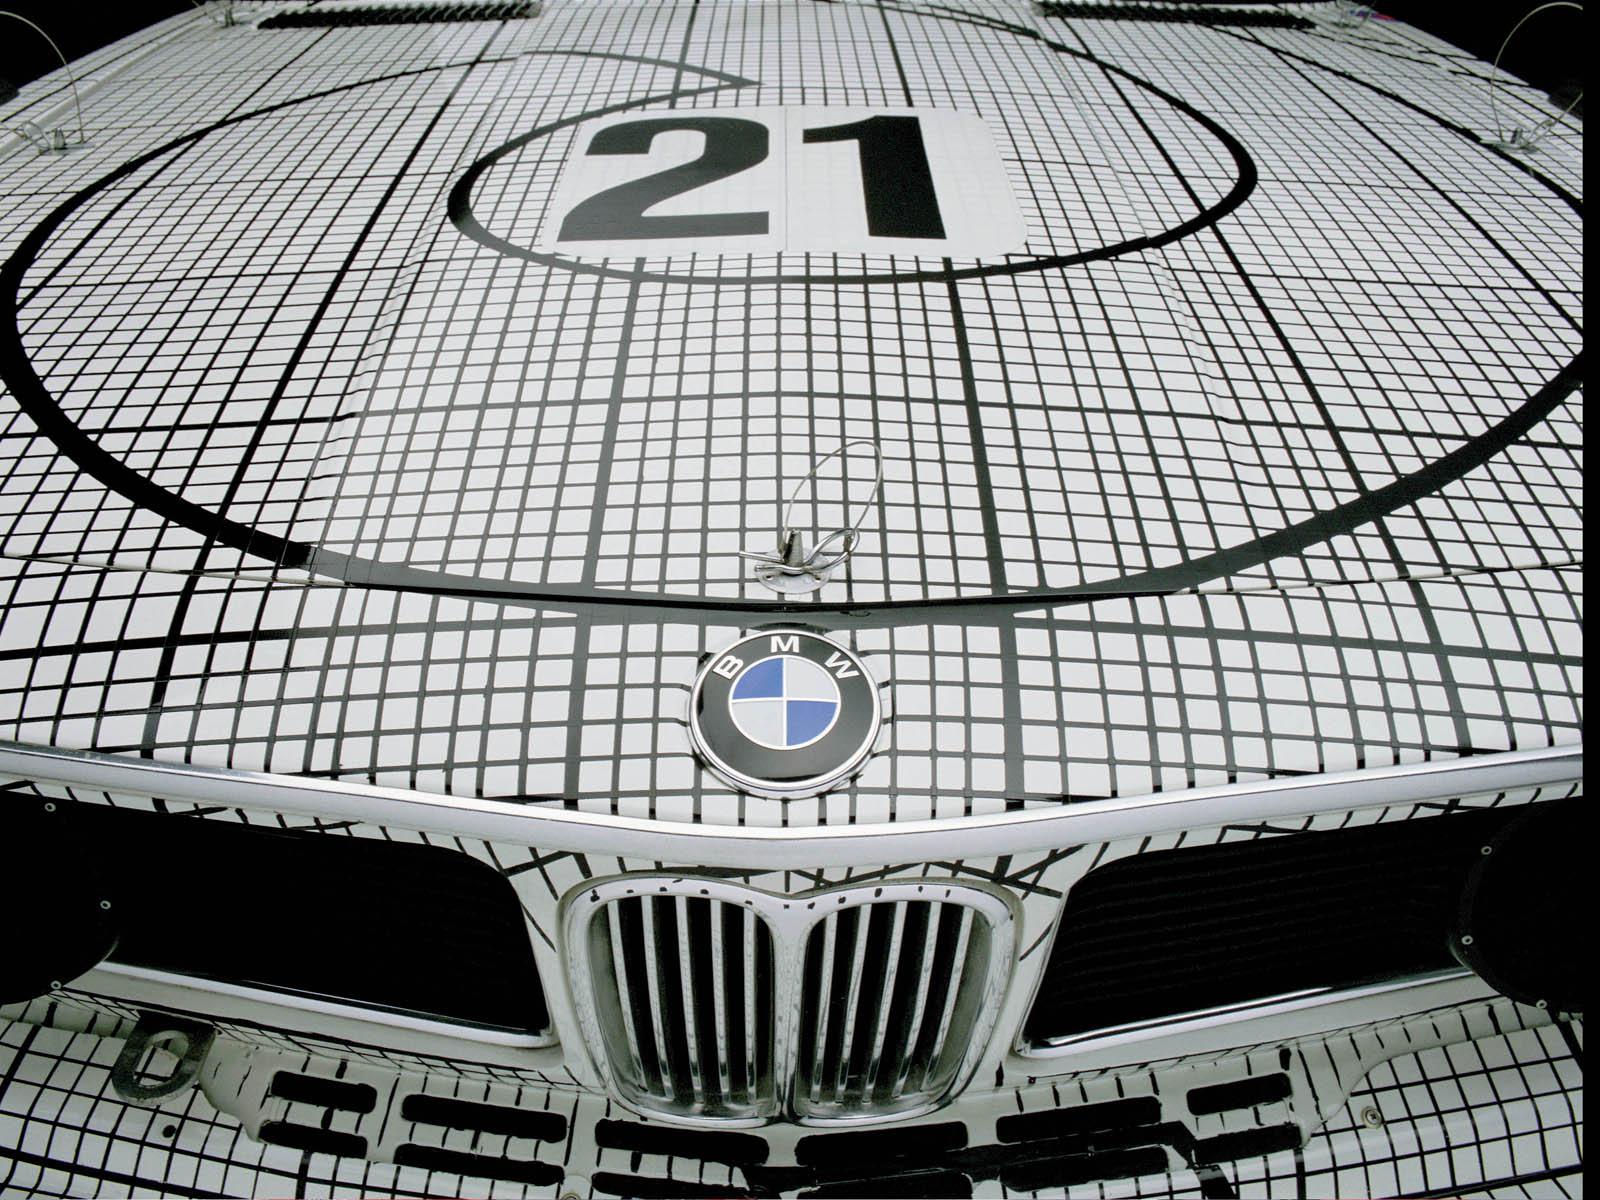 Второй экземпляр BMW Art car - bmw 3.0 csl